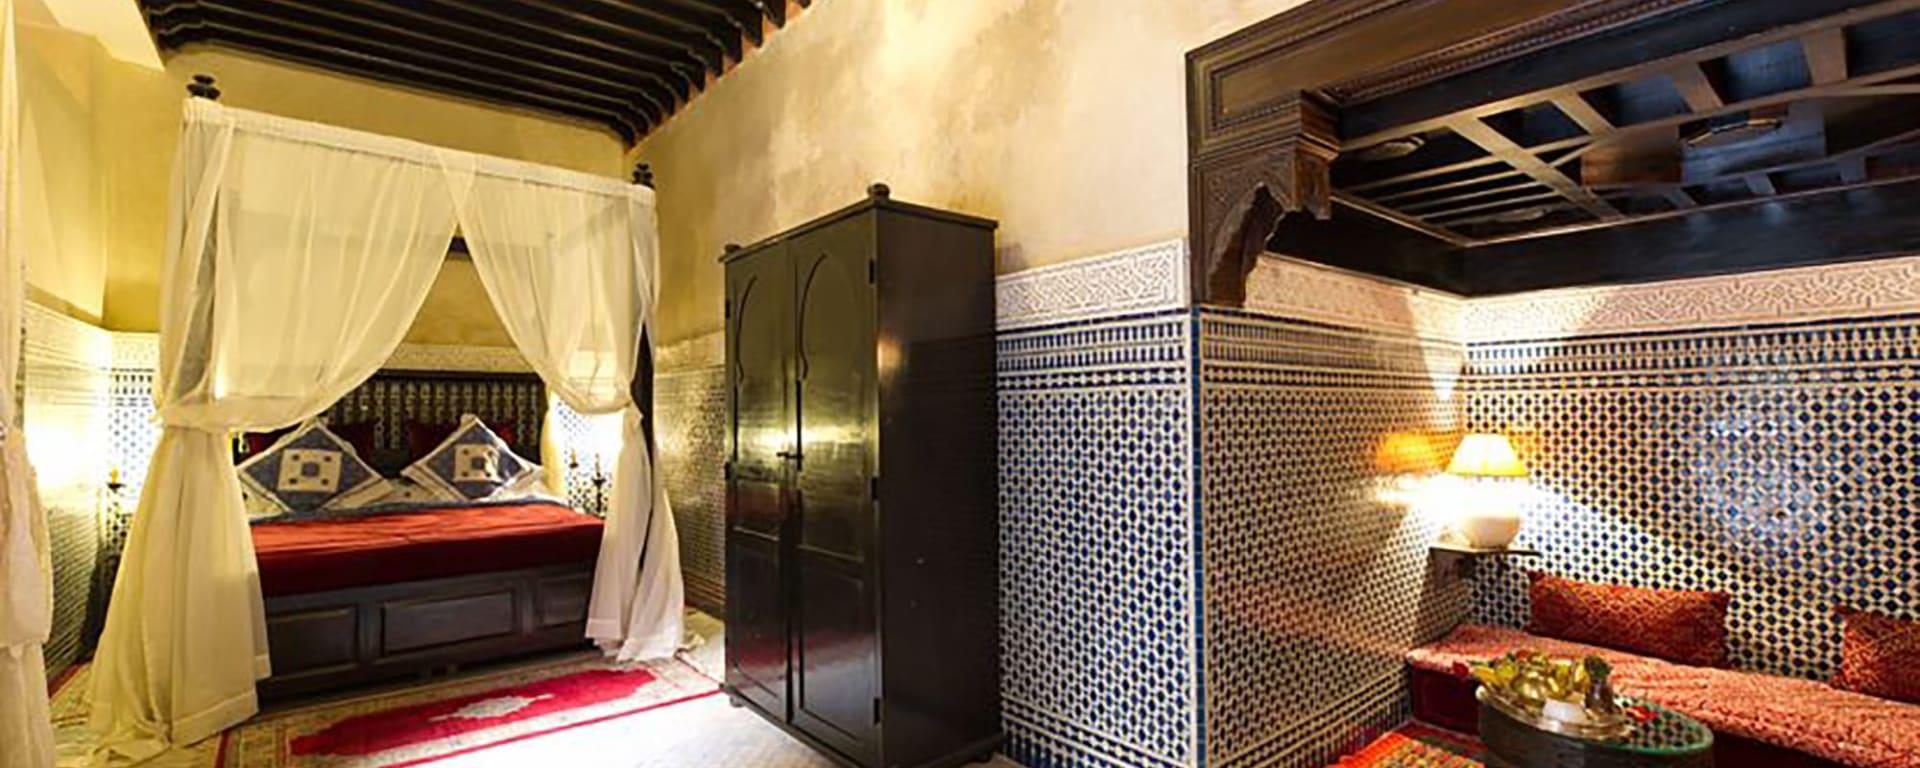 Riad Yacout in Meknès: Marokko Riad Yacout Suite